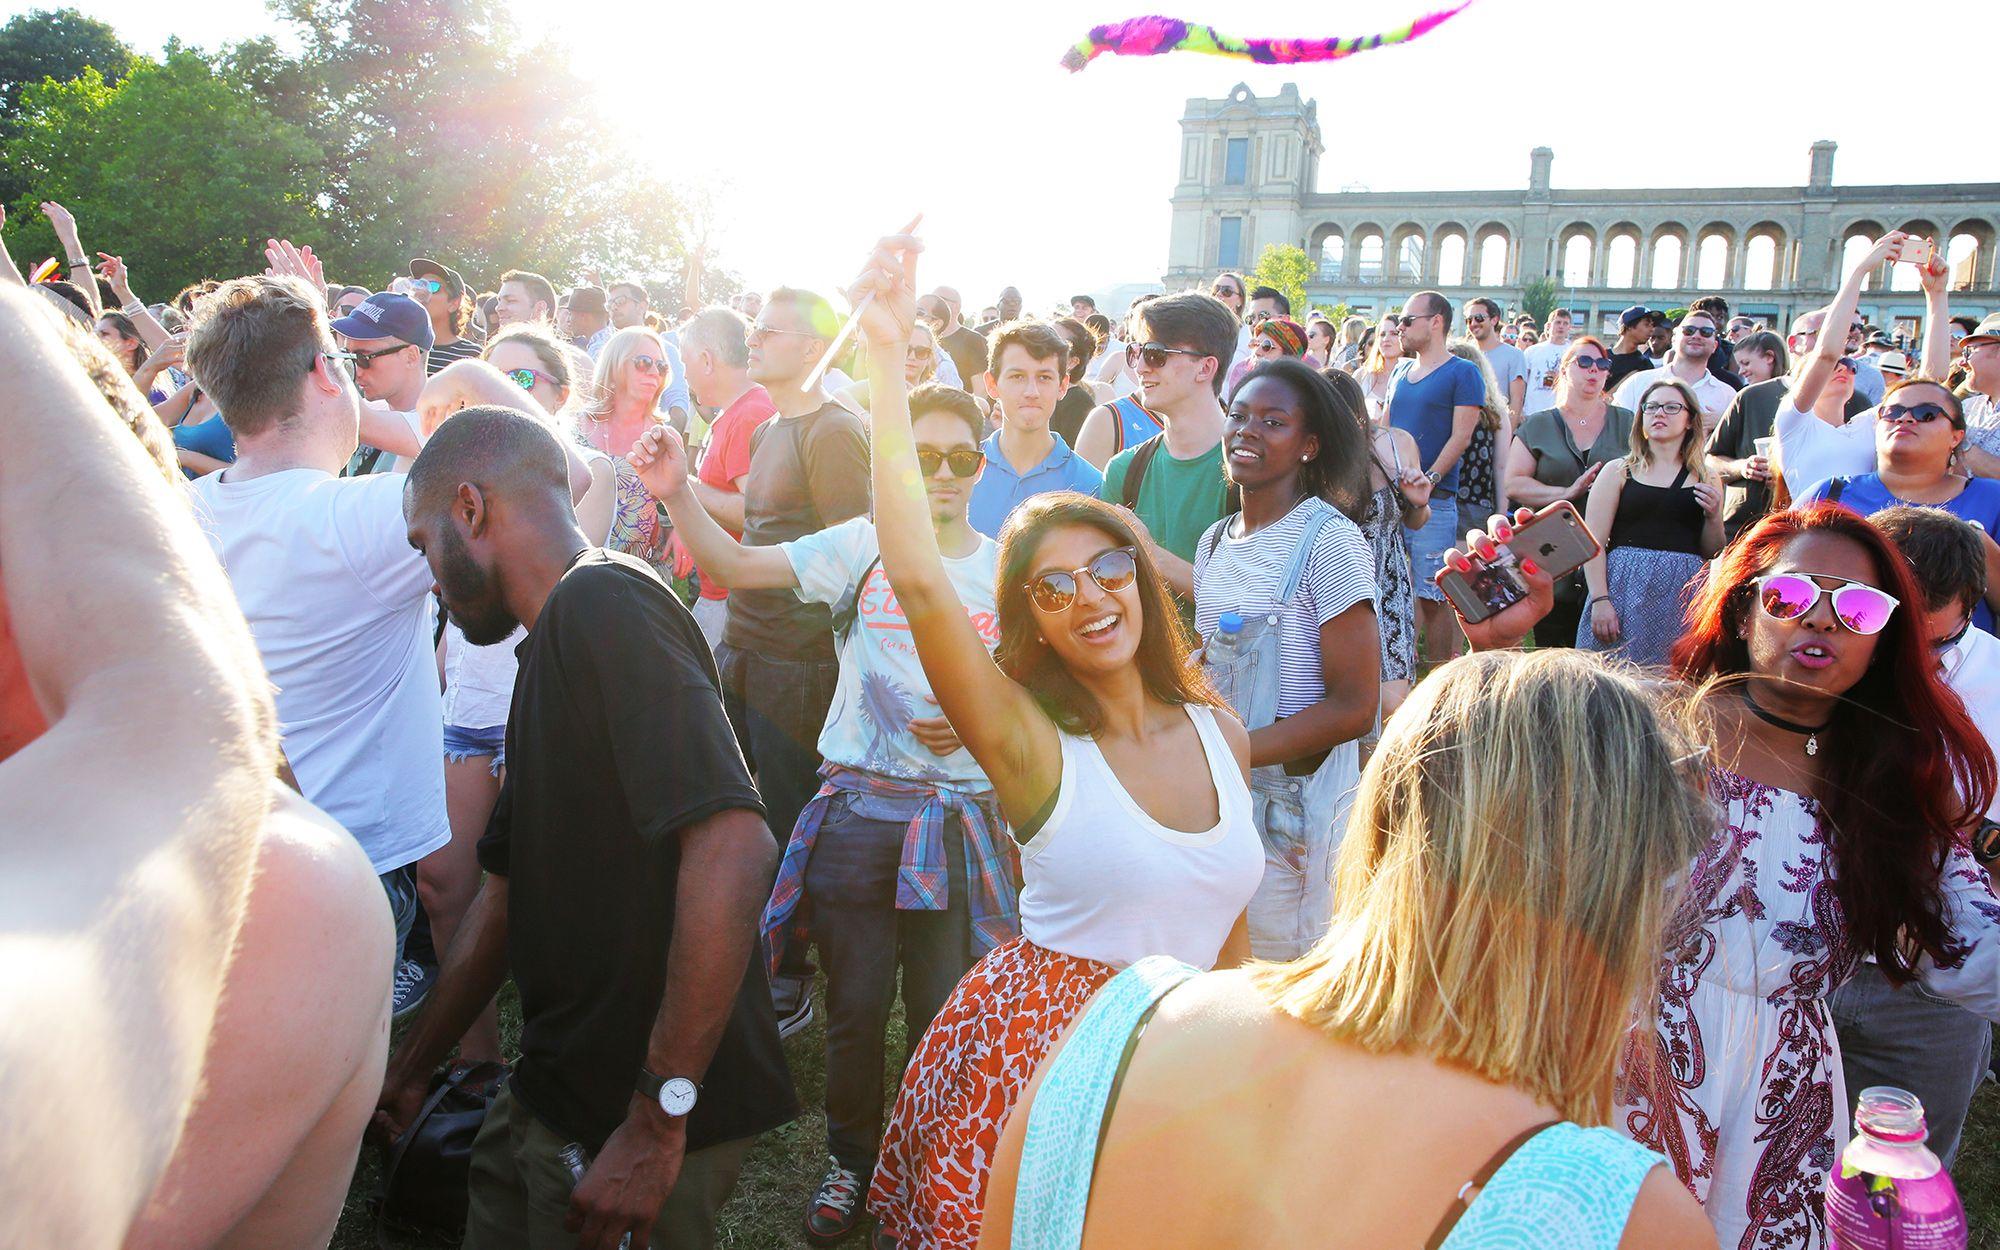 Kaleidoscope Festival, London